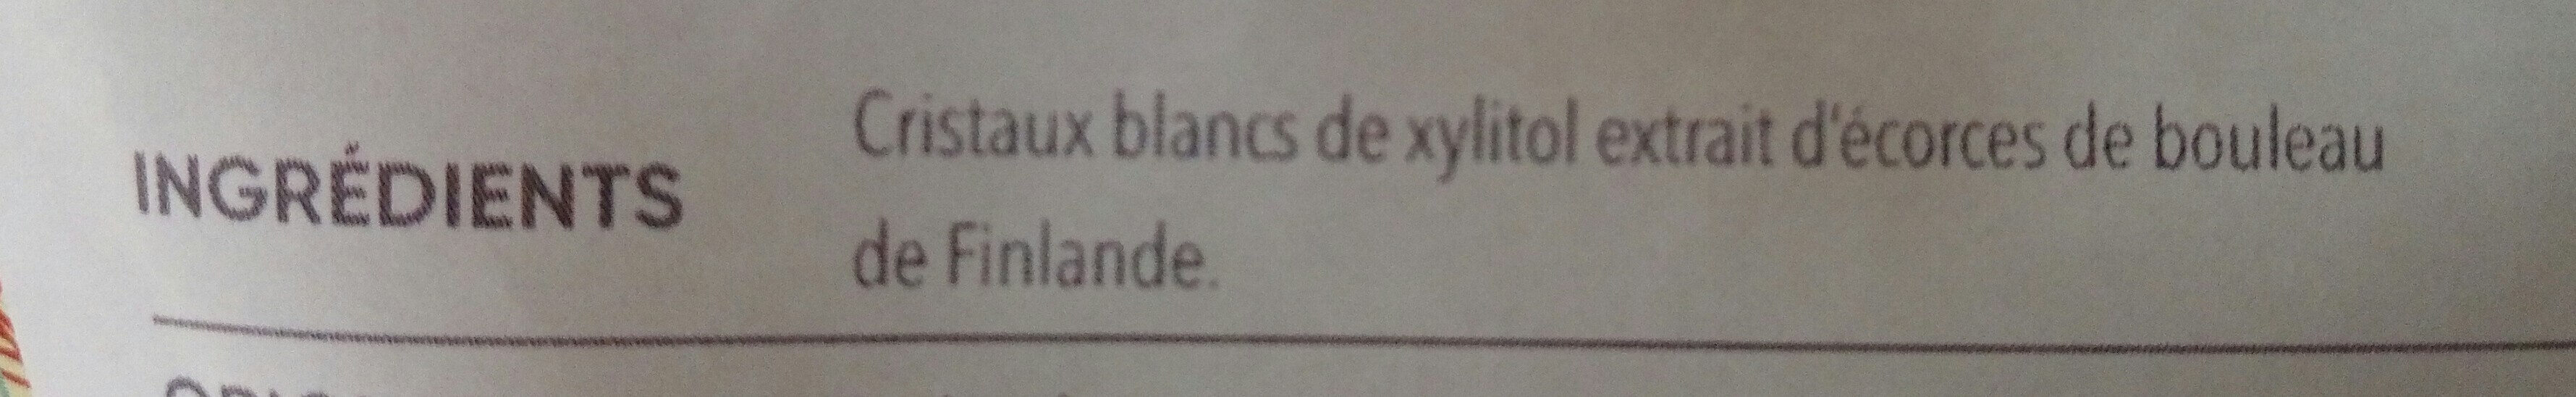 Xylitol - Ingrédients - fr